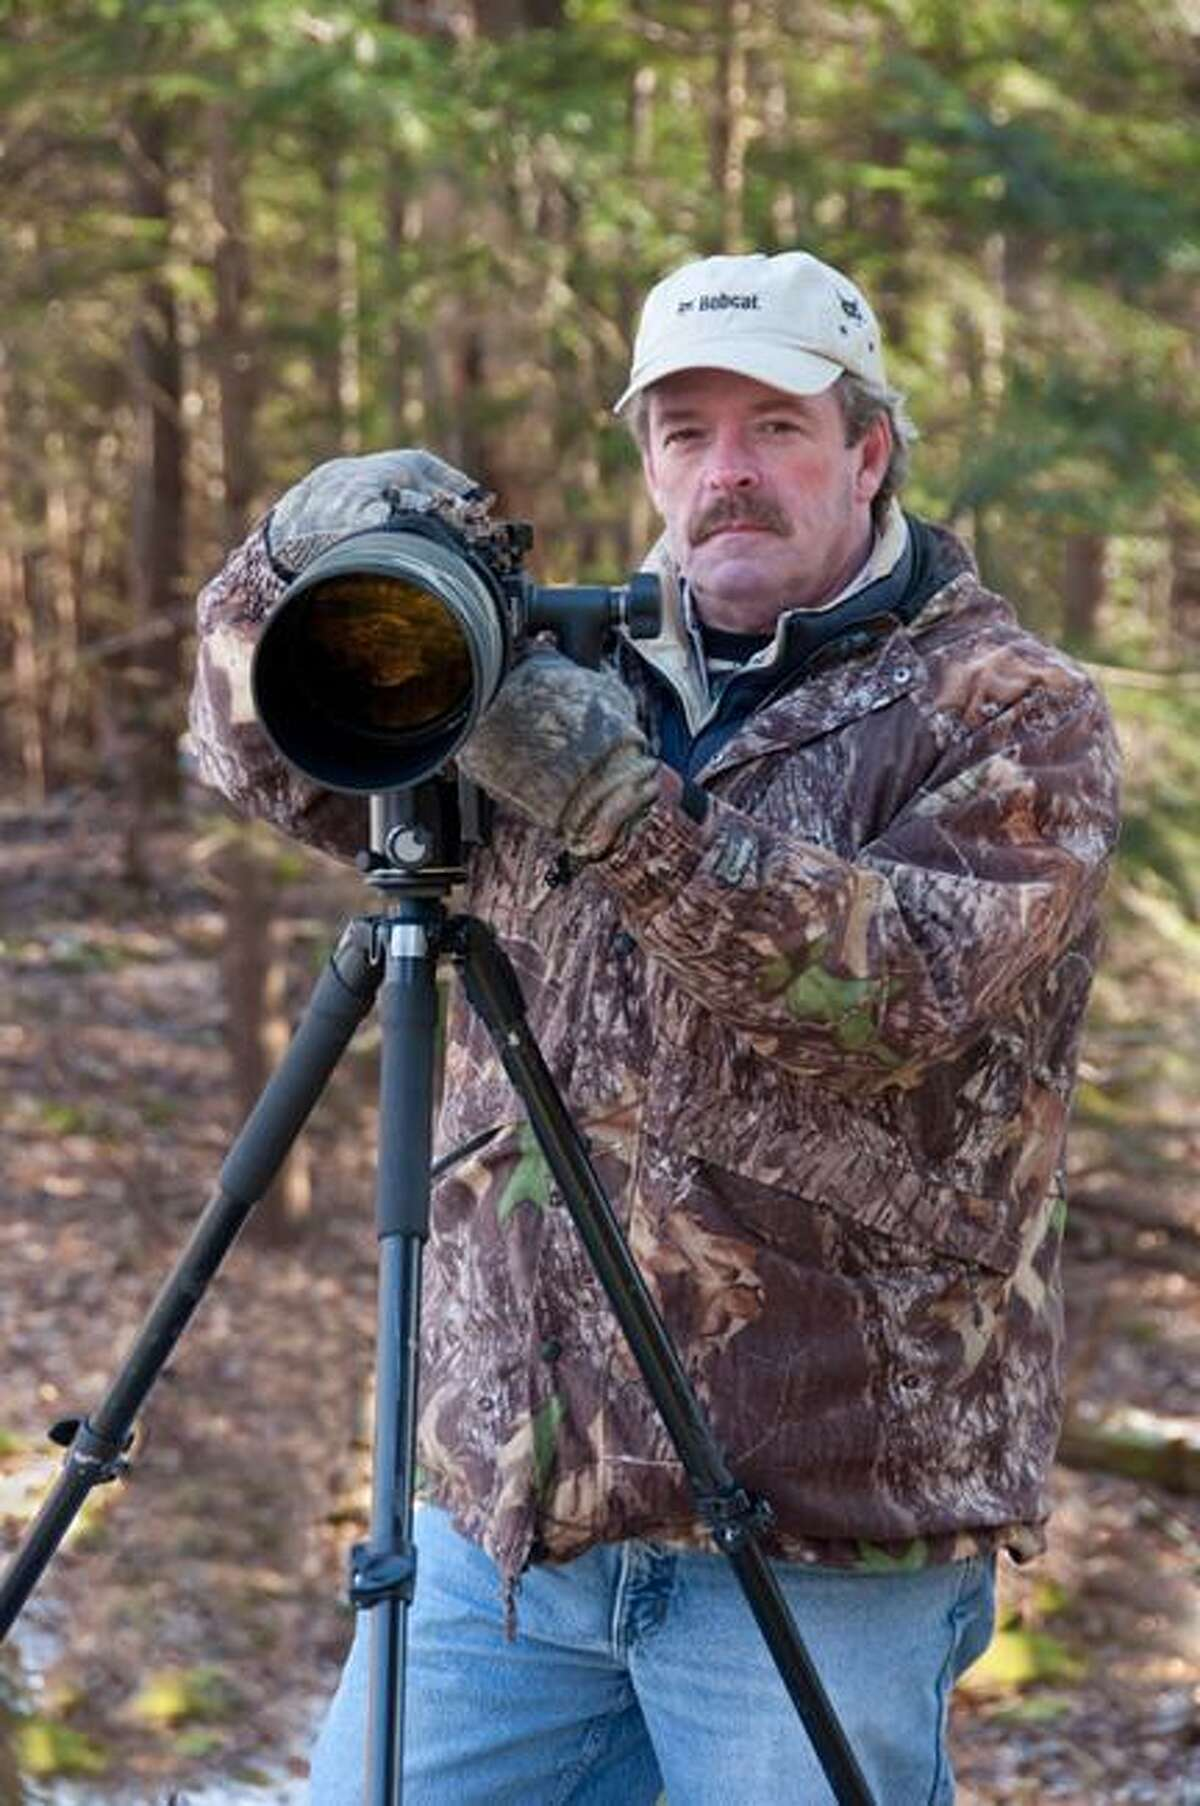 Photo Courtesy Bob Havener Bob Havener and his Nikon D-90 Digital SLR.